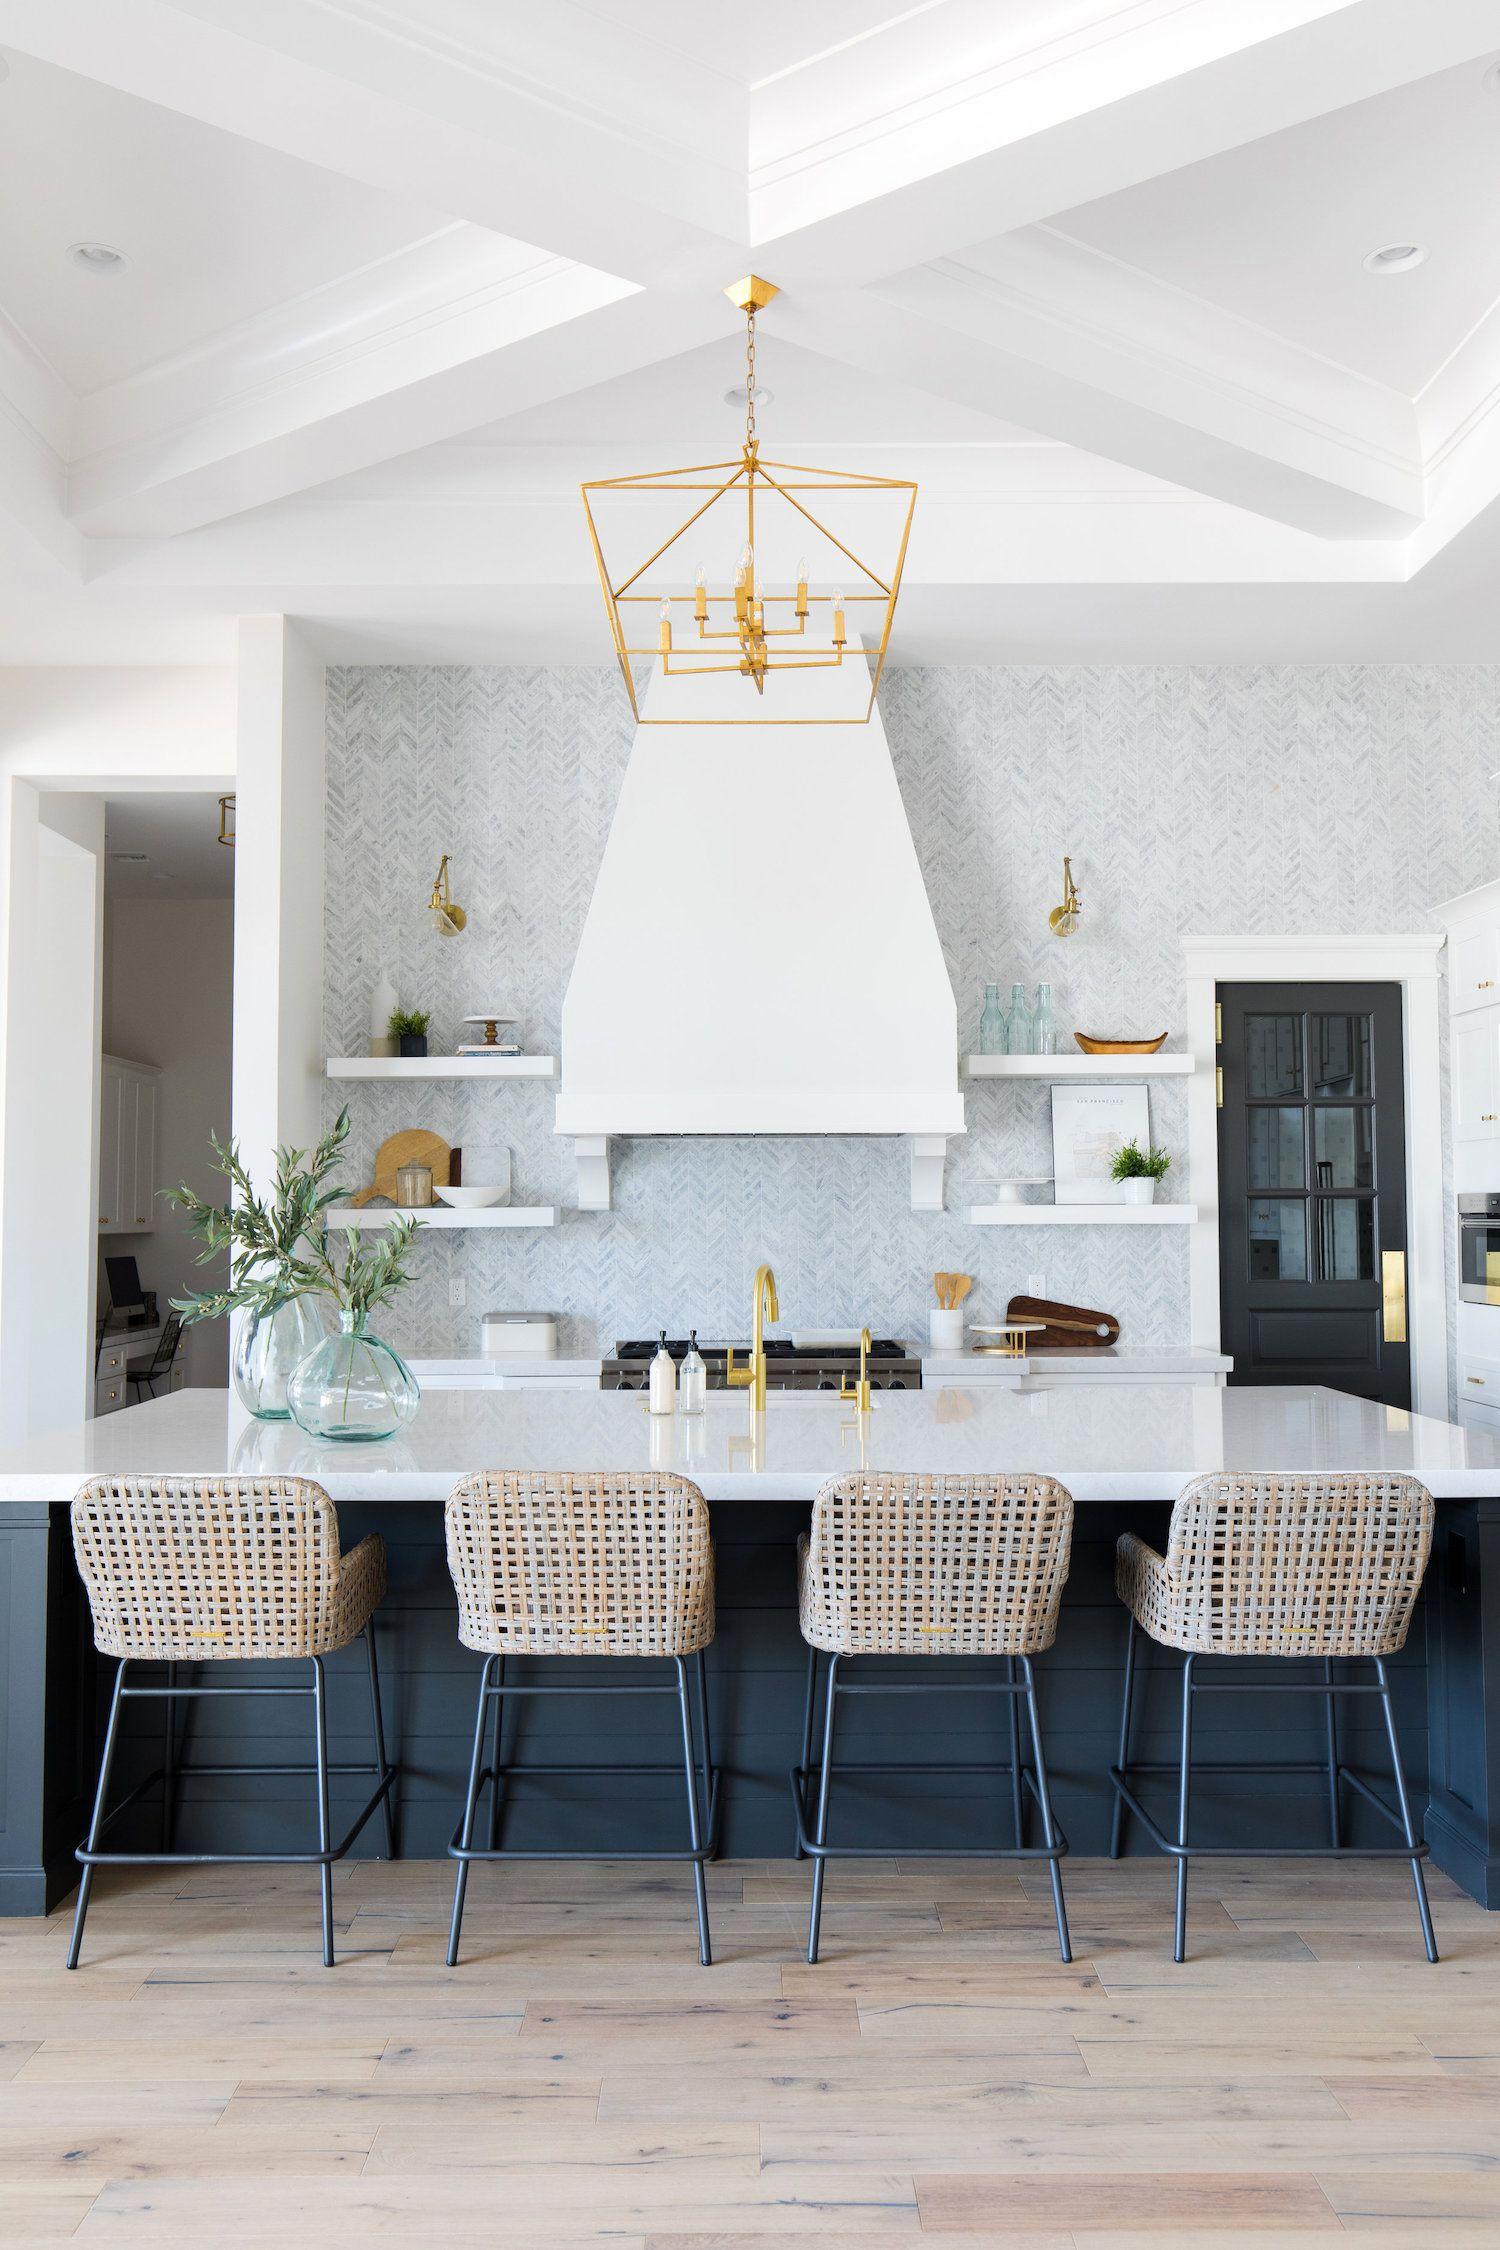 An Inspiring Interview With E Interiors A Look Inside Their Latest Dream Home Coastal Kitchen Design Home Decor House Interior